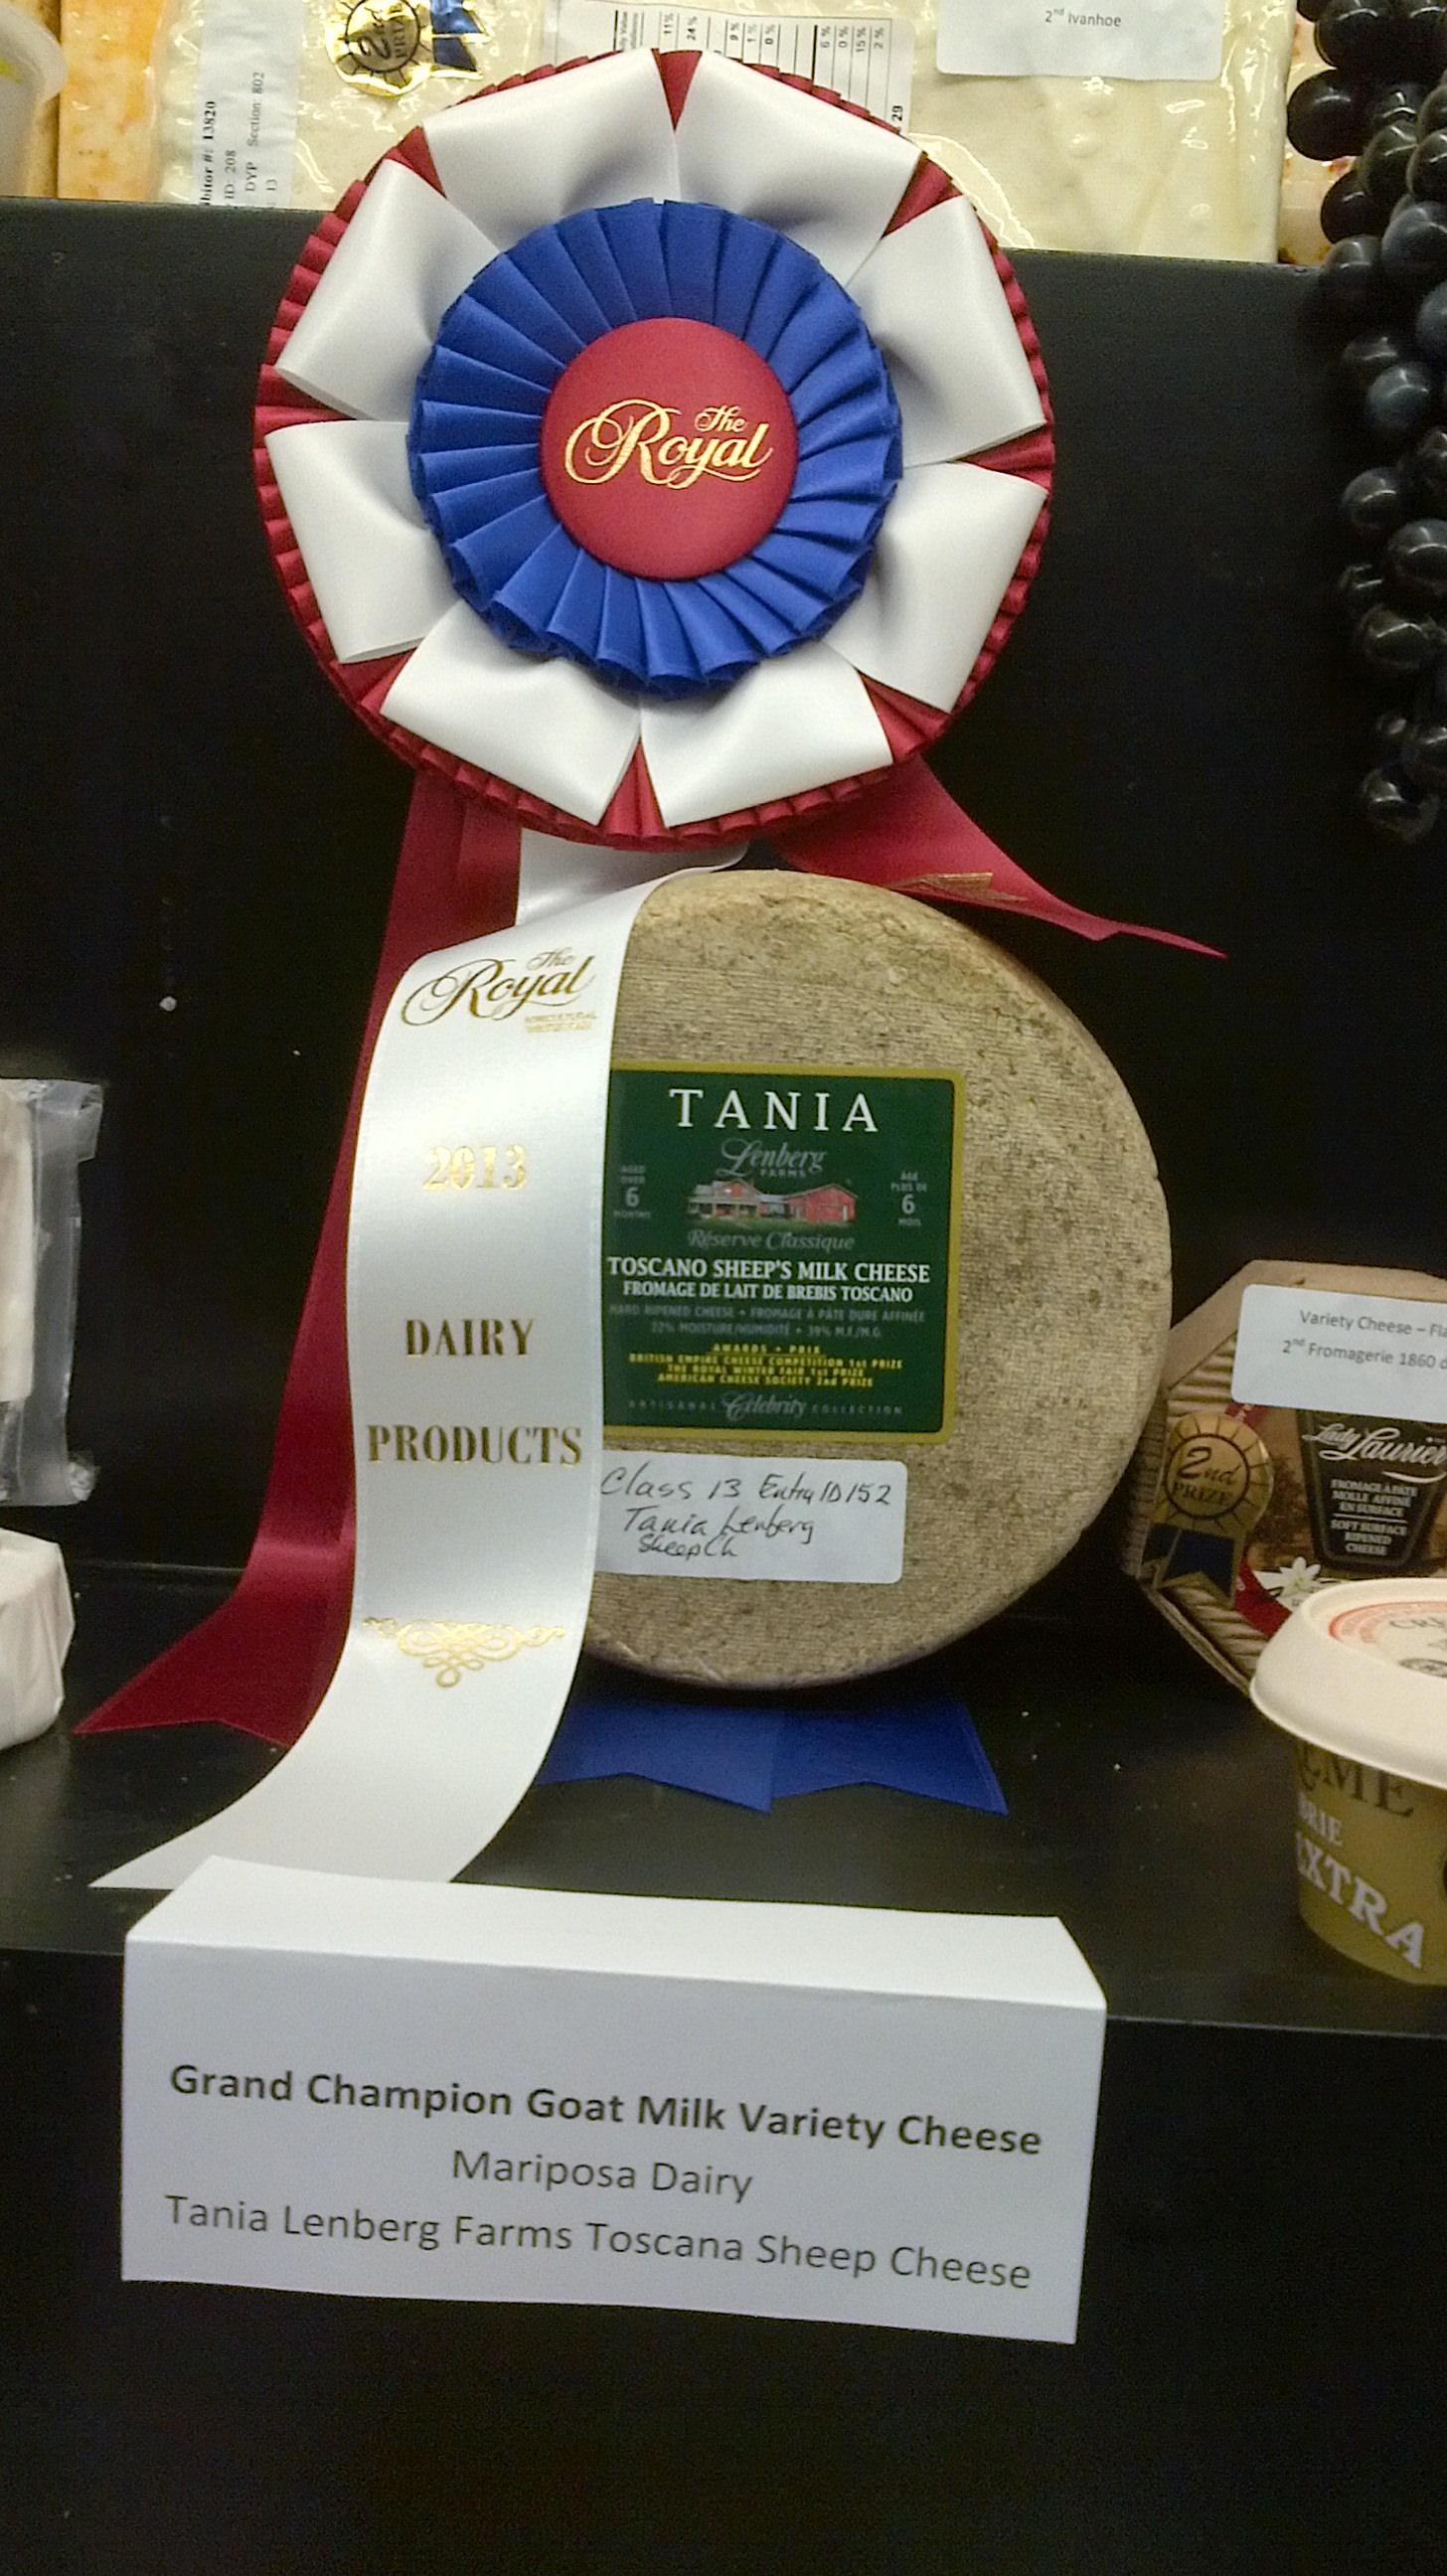 Grand Champion: Tania Lenberg Farms Toscano Sheep Cheese.